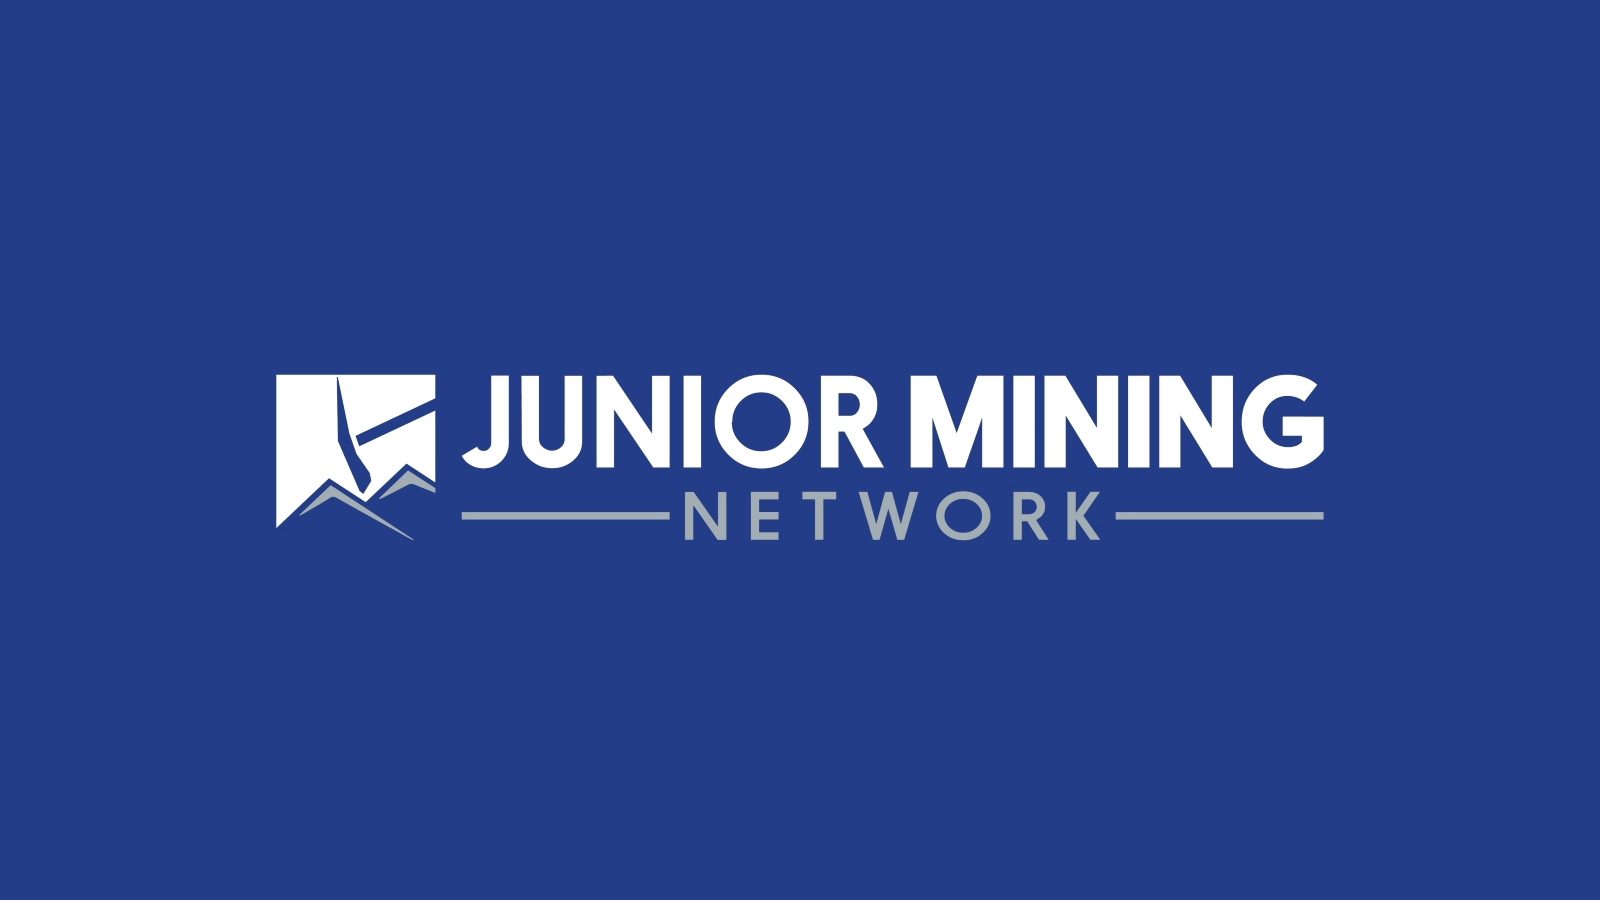 Corvus Gold Updates Mineral Resource Estimate for North ...